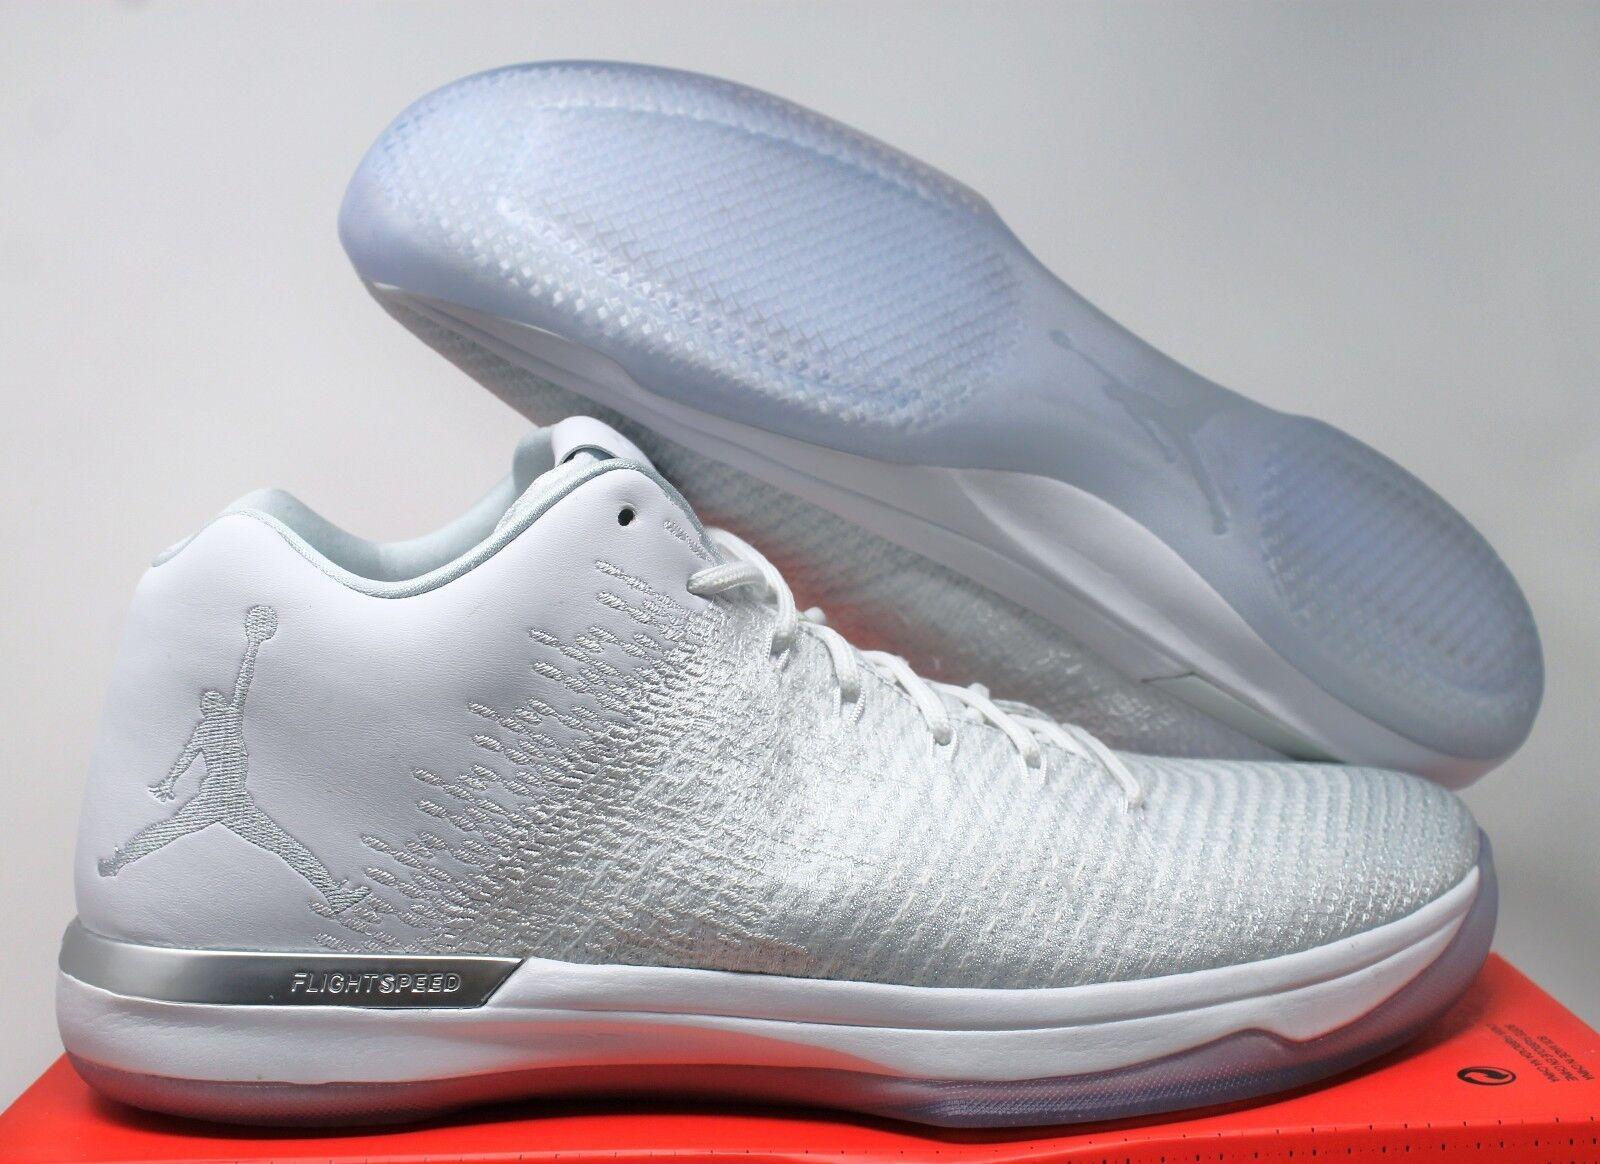 Nike Air Jordan XXXI 31 Low White-Pure Platinum SZ 14 [897564-100]